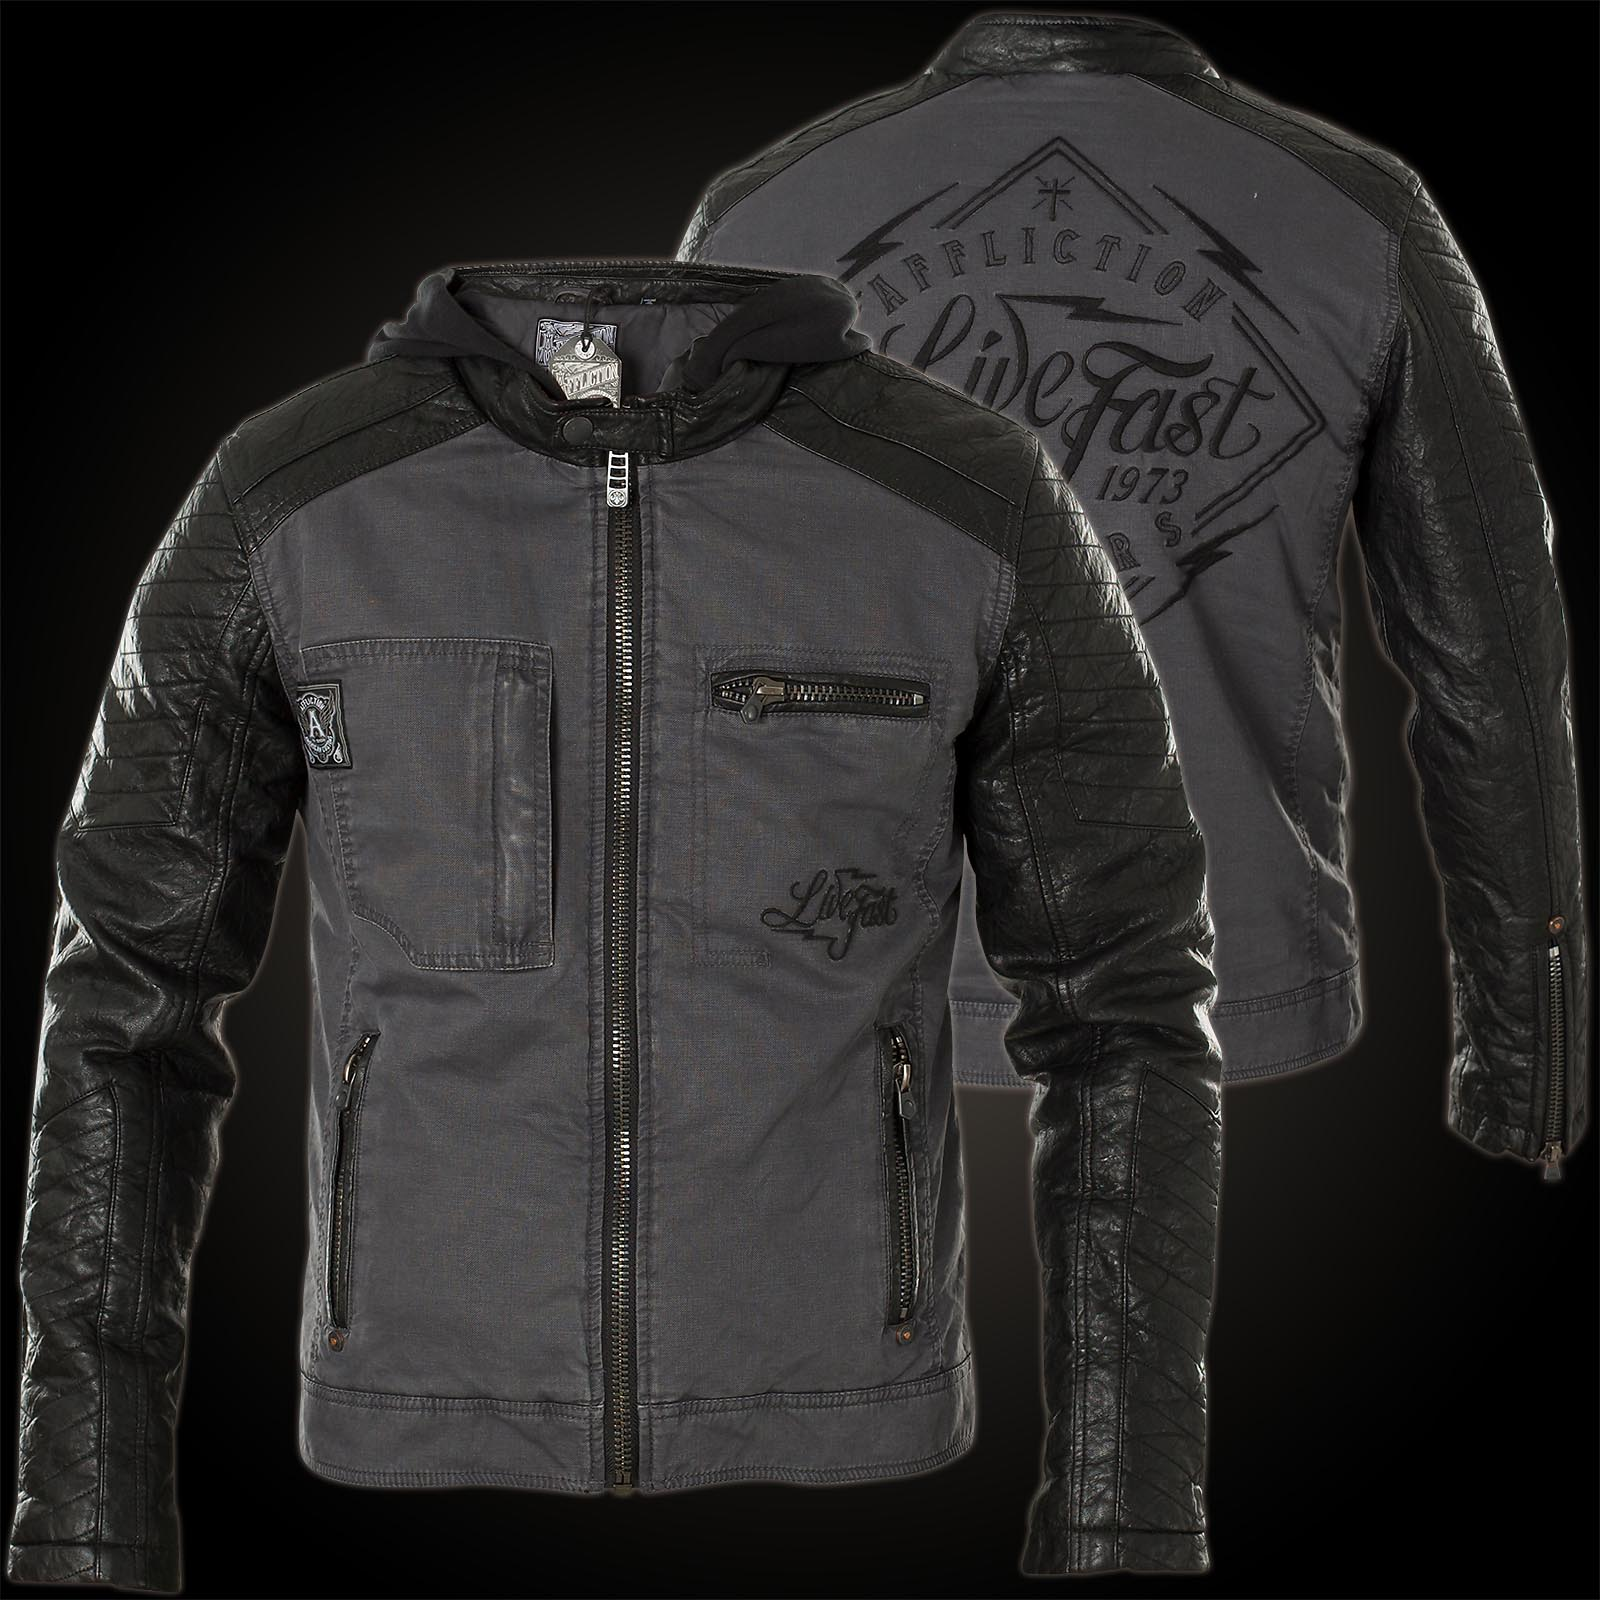 Affliction silent leather jacket